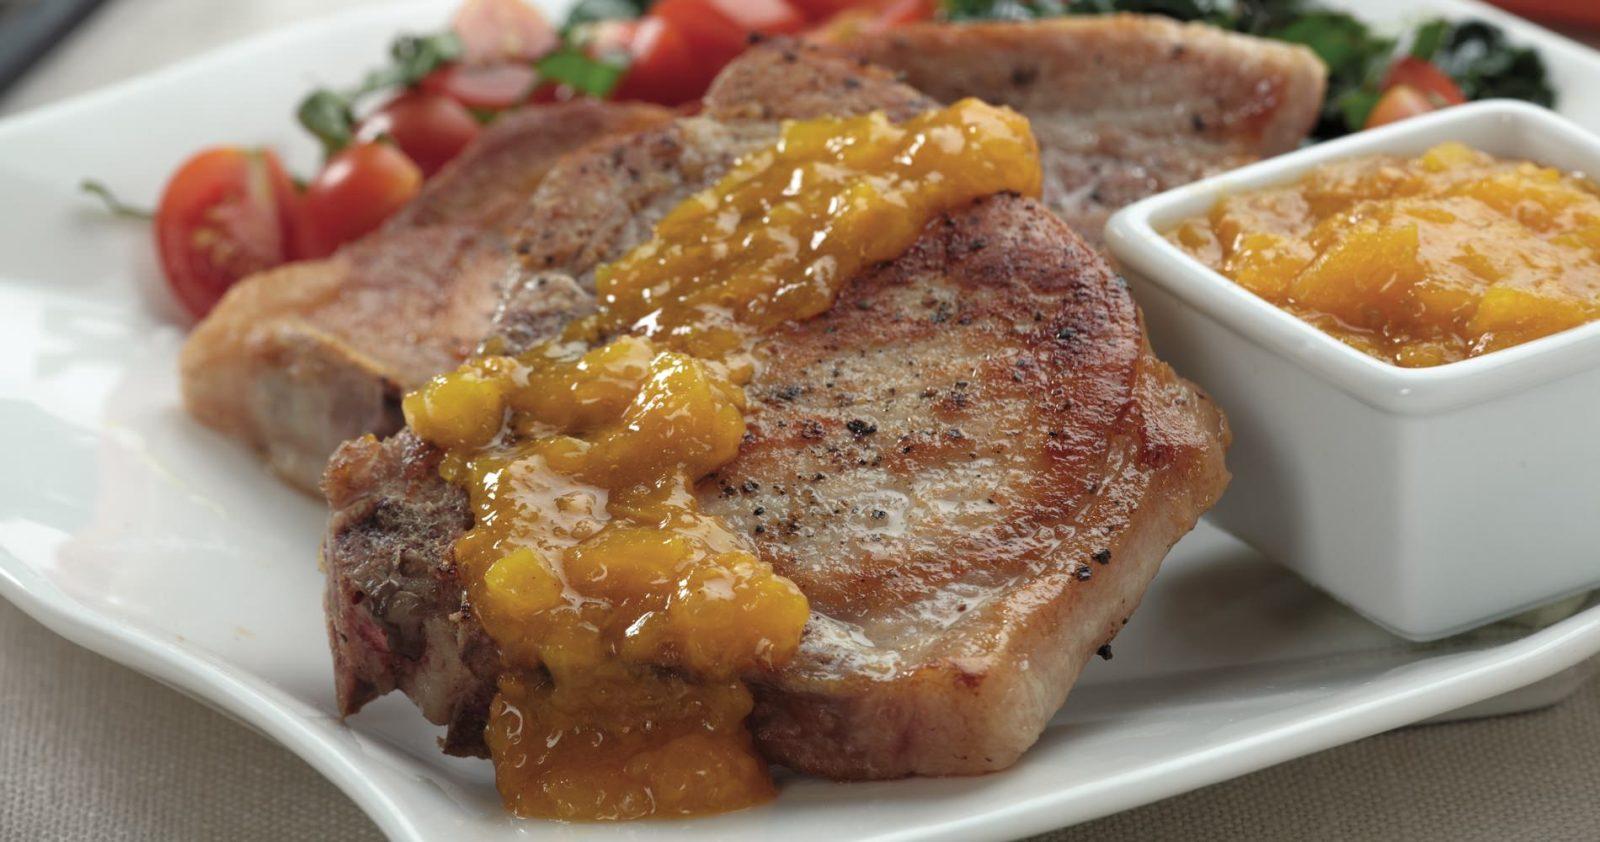 Chuleta de Lomo de Cerdo en salsa de tomate de árbol